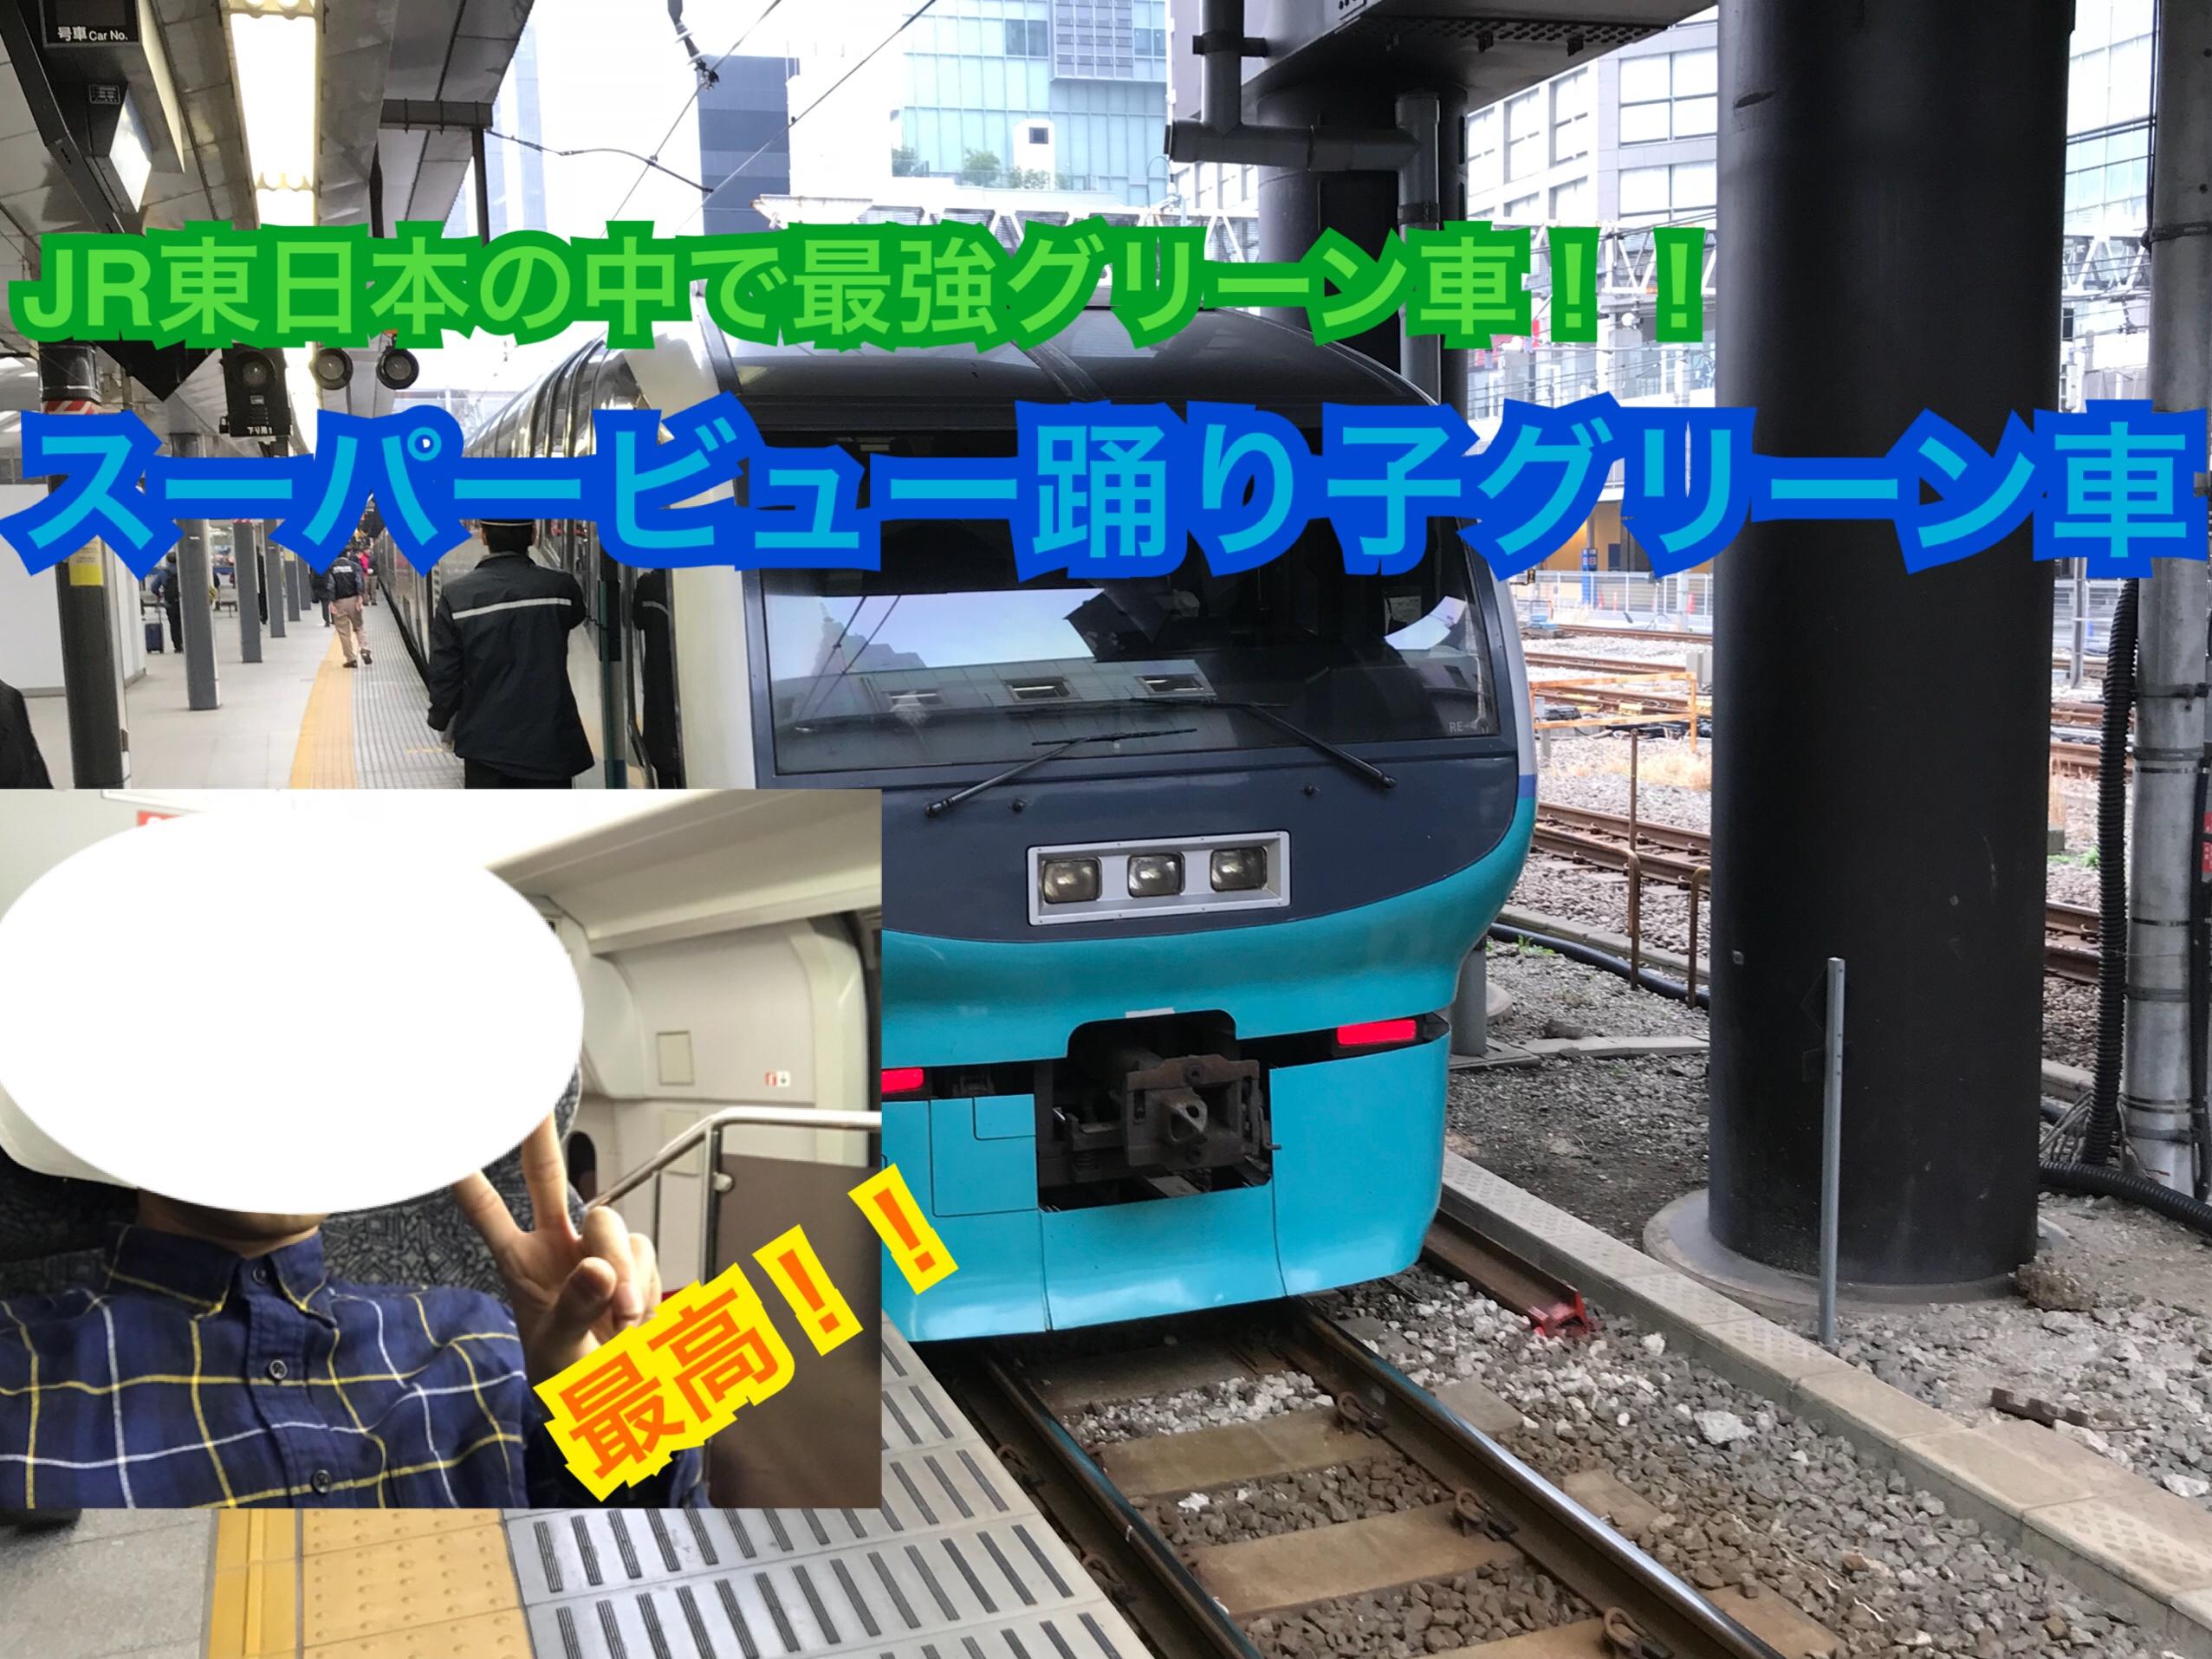 JR東日本最強グリーン車!スーパービュー踊り子グリーン車の座席、設備をご紹介!